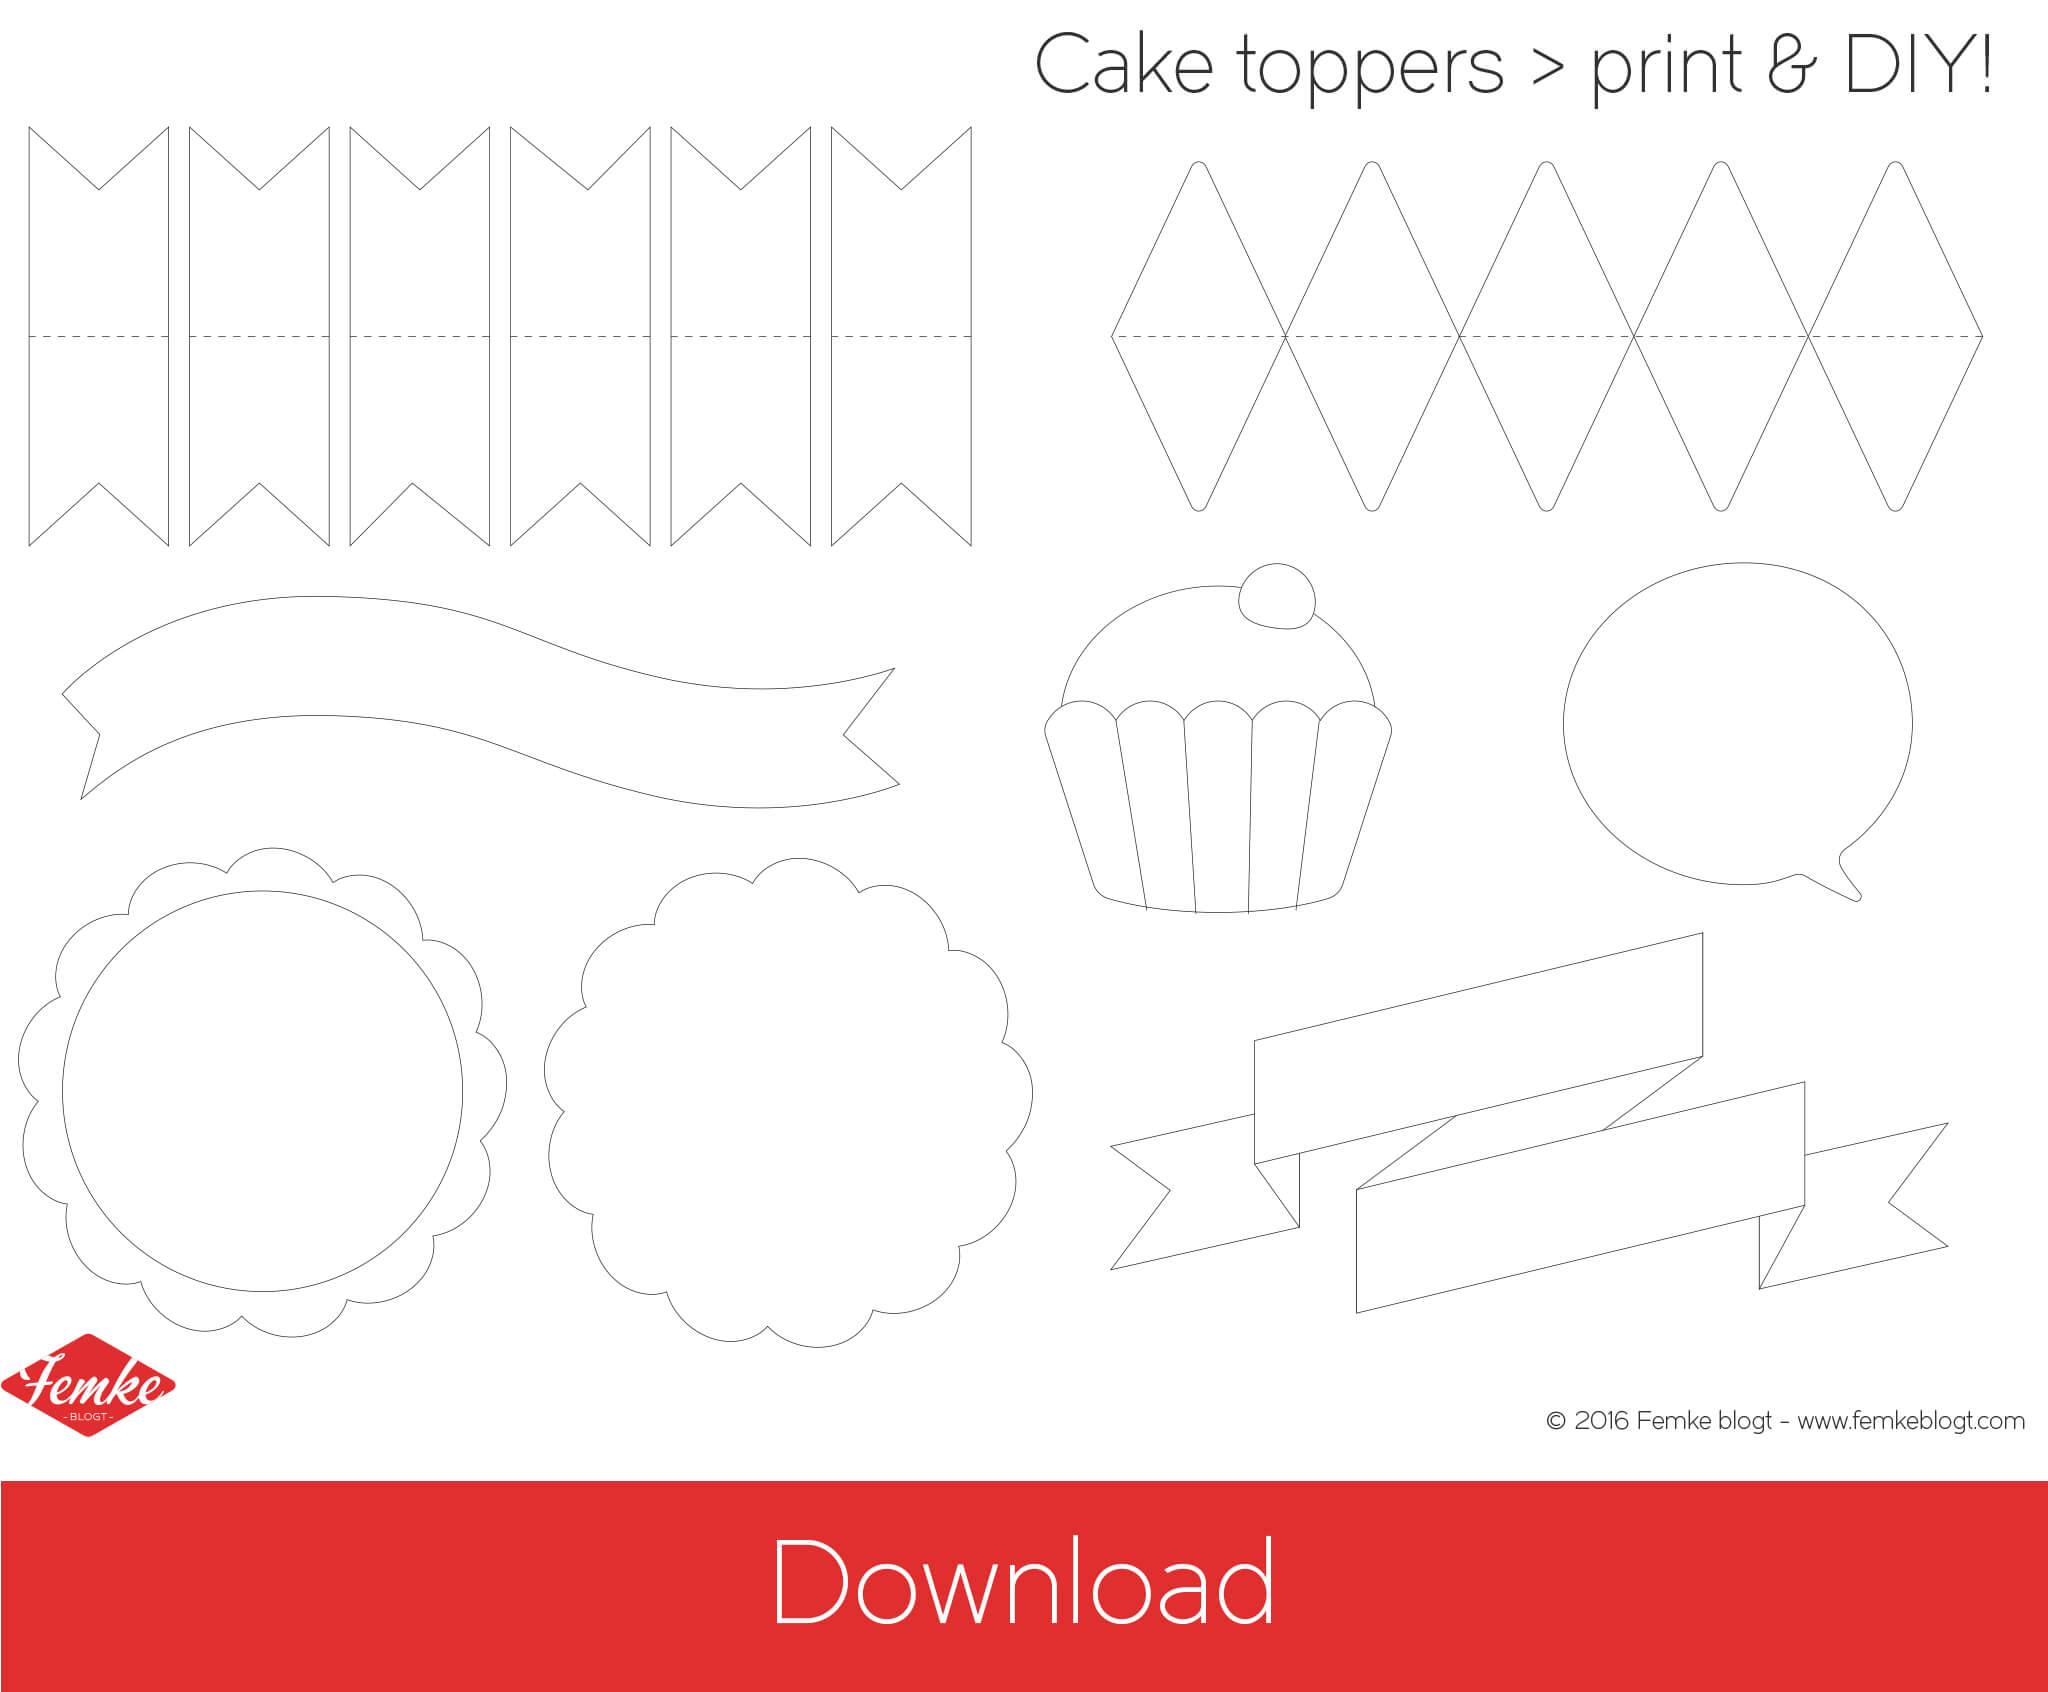 Download printable DIY cake topper